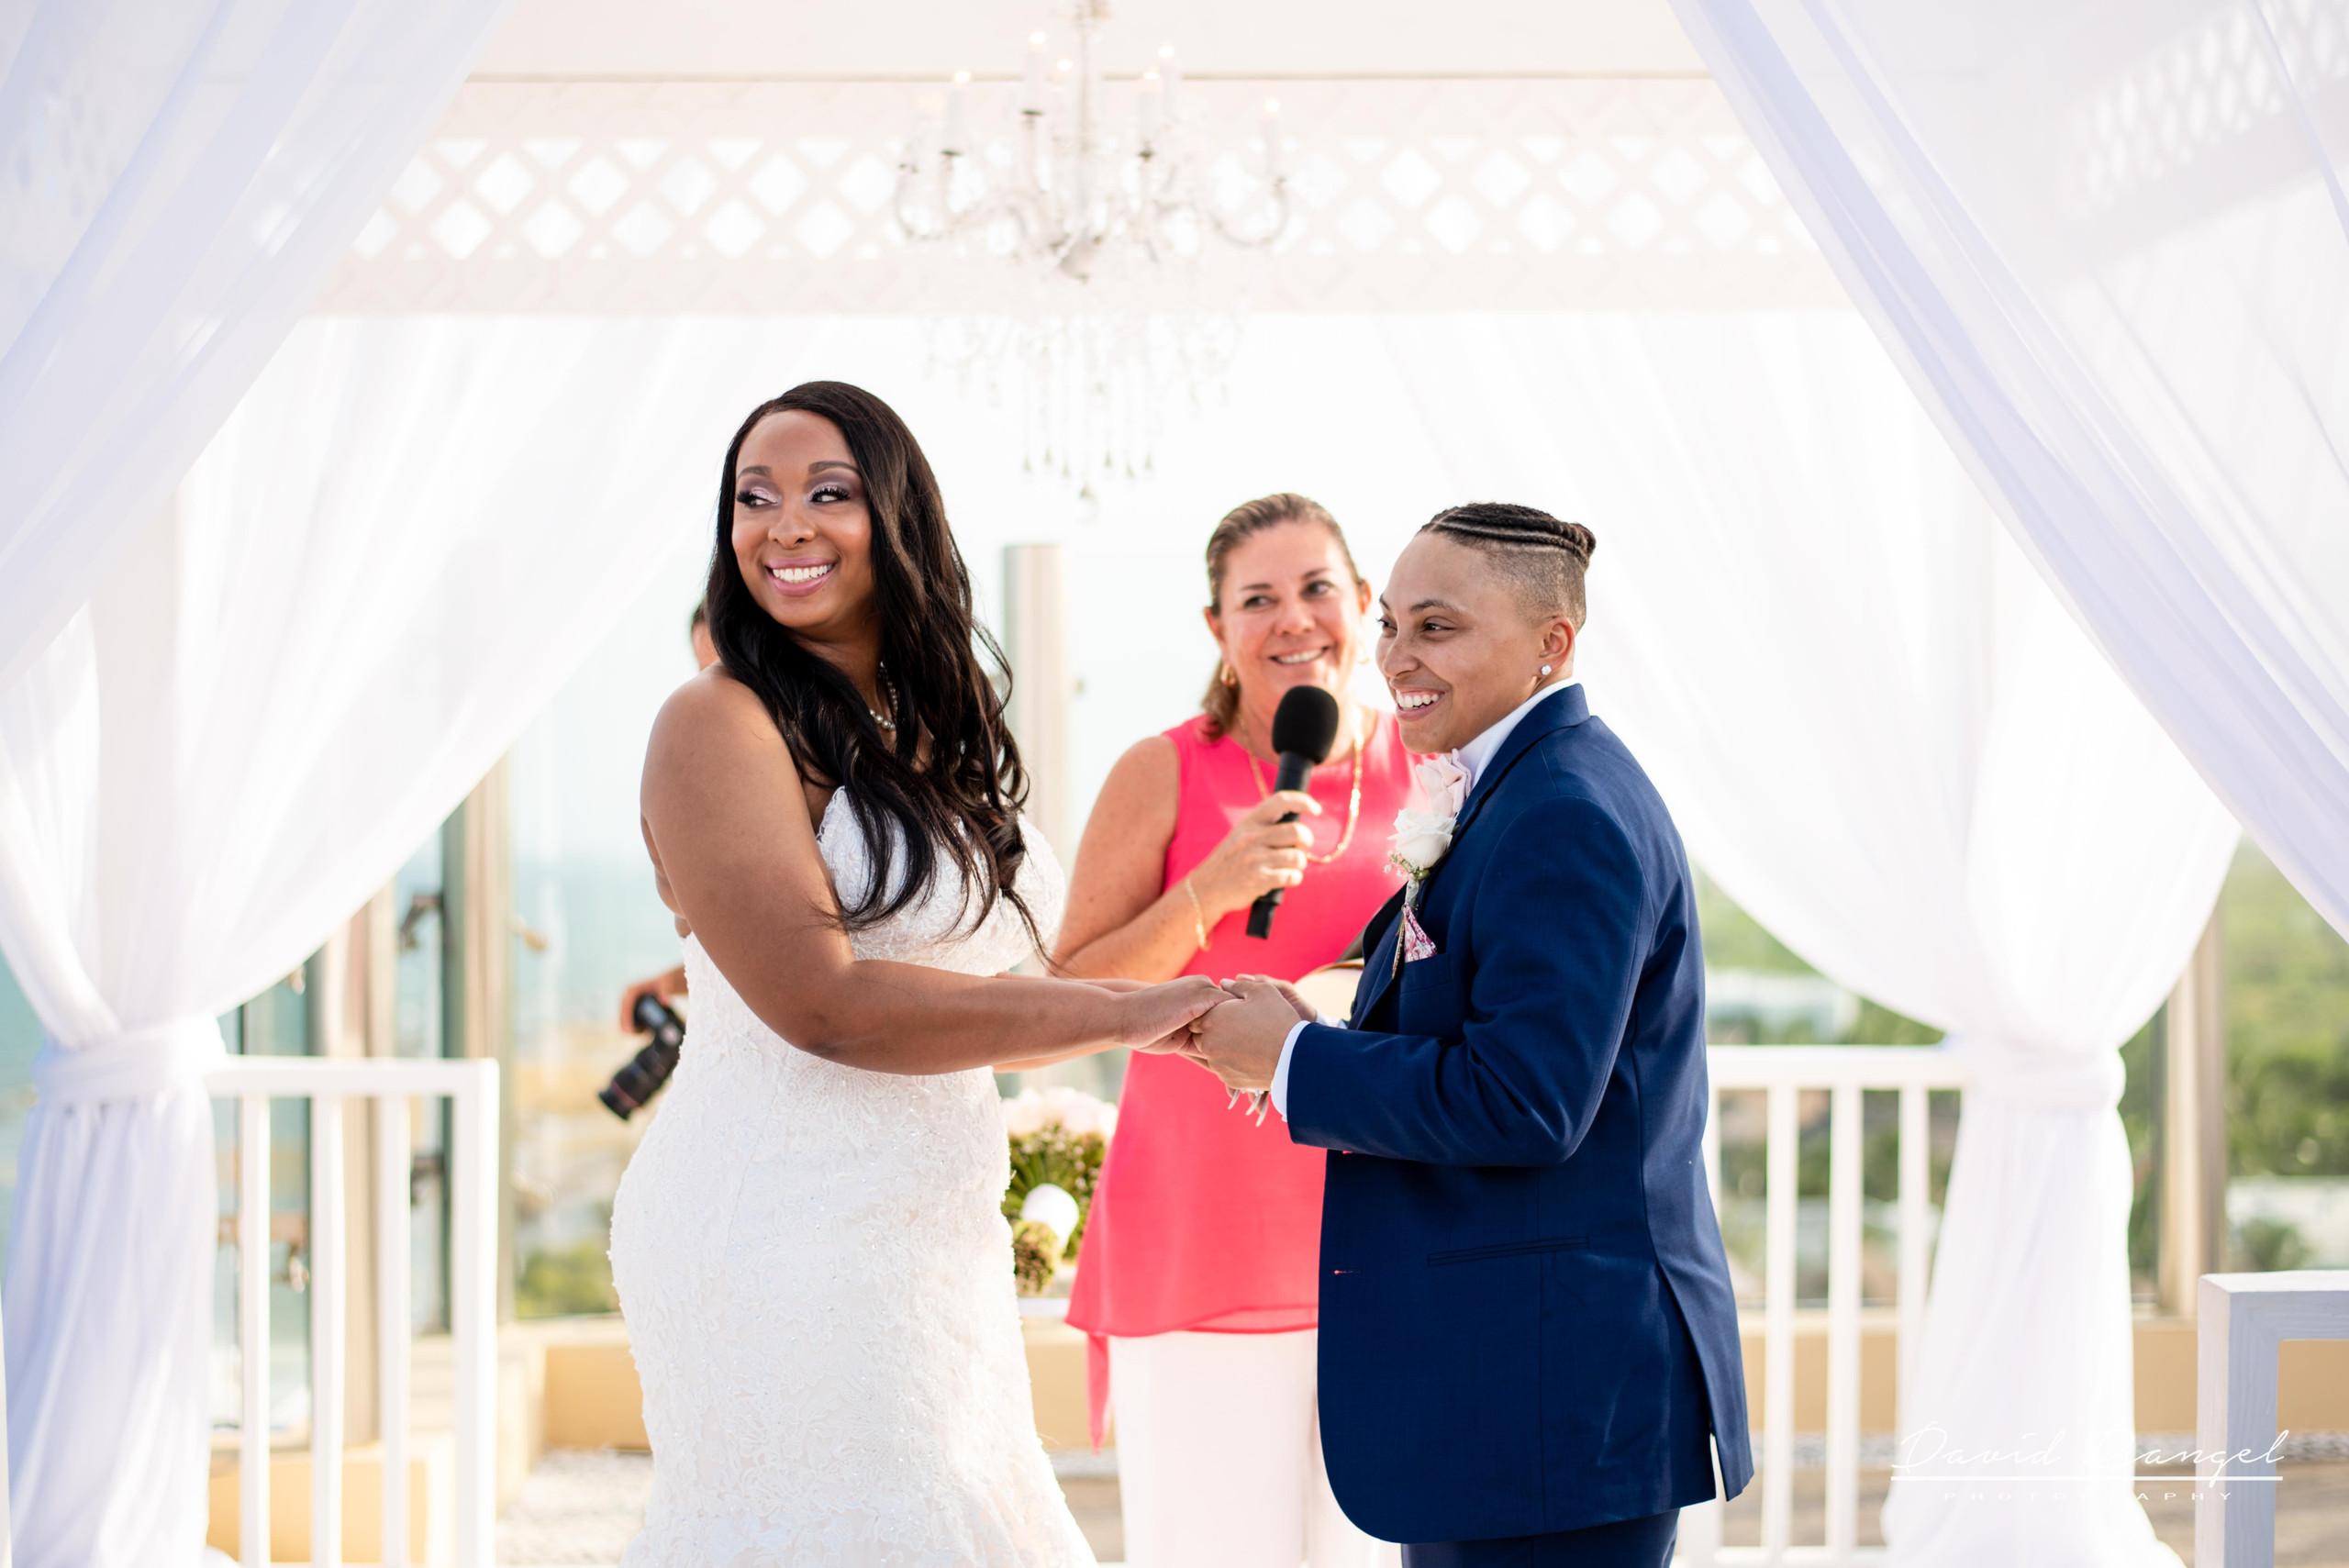 happy+marriage+girls+wedding+smile